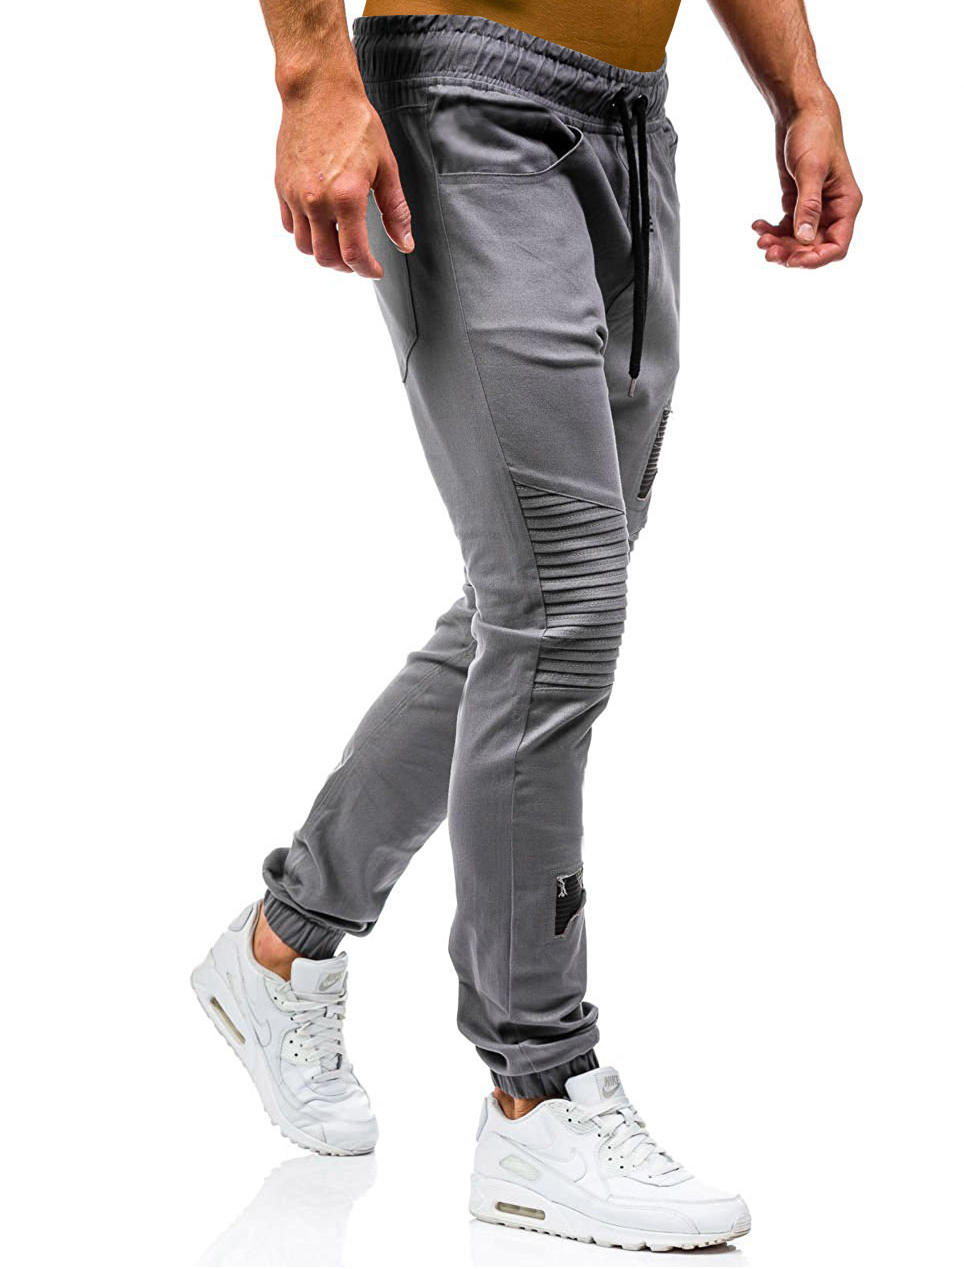 Men Sweatpants Casual Pants Slim fit Drawstring Sweatpants Slacks Elastic Waist Patchwork Pleated Ultrathin Male Trousers Jogger 23